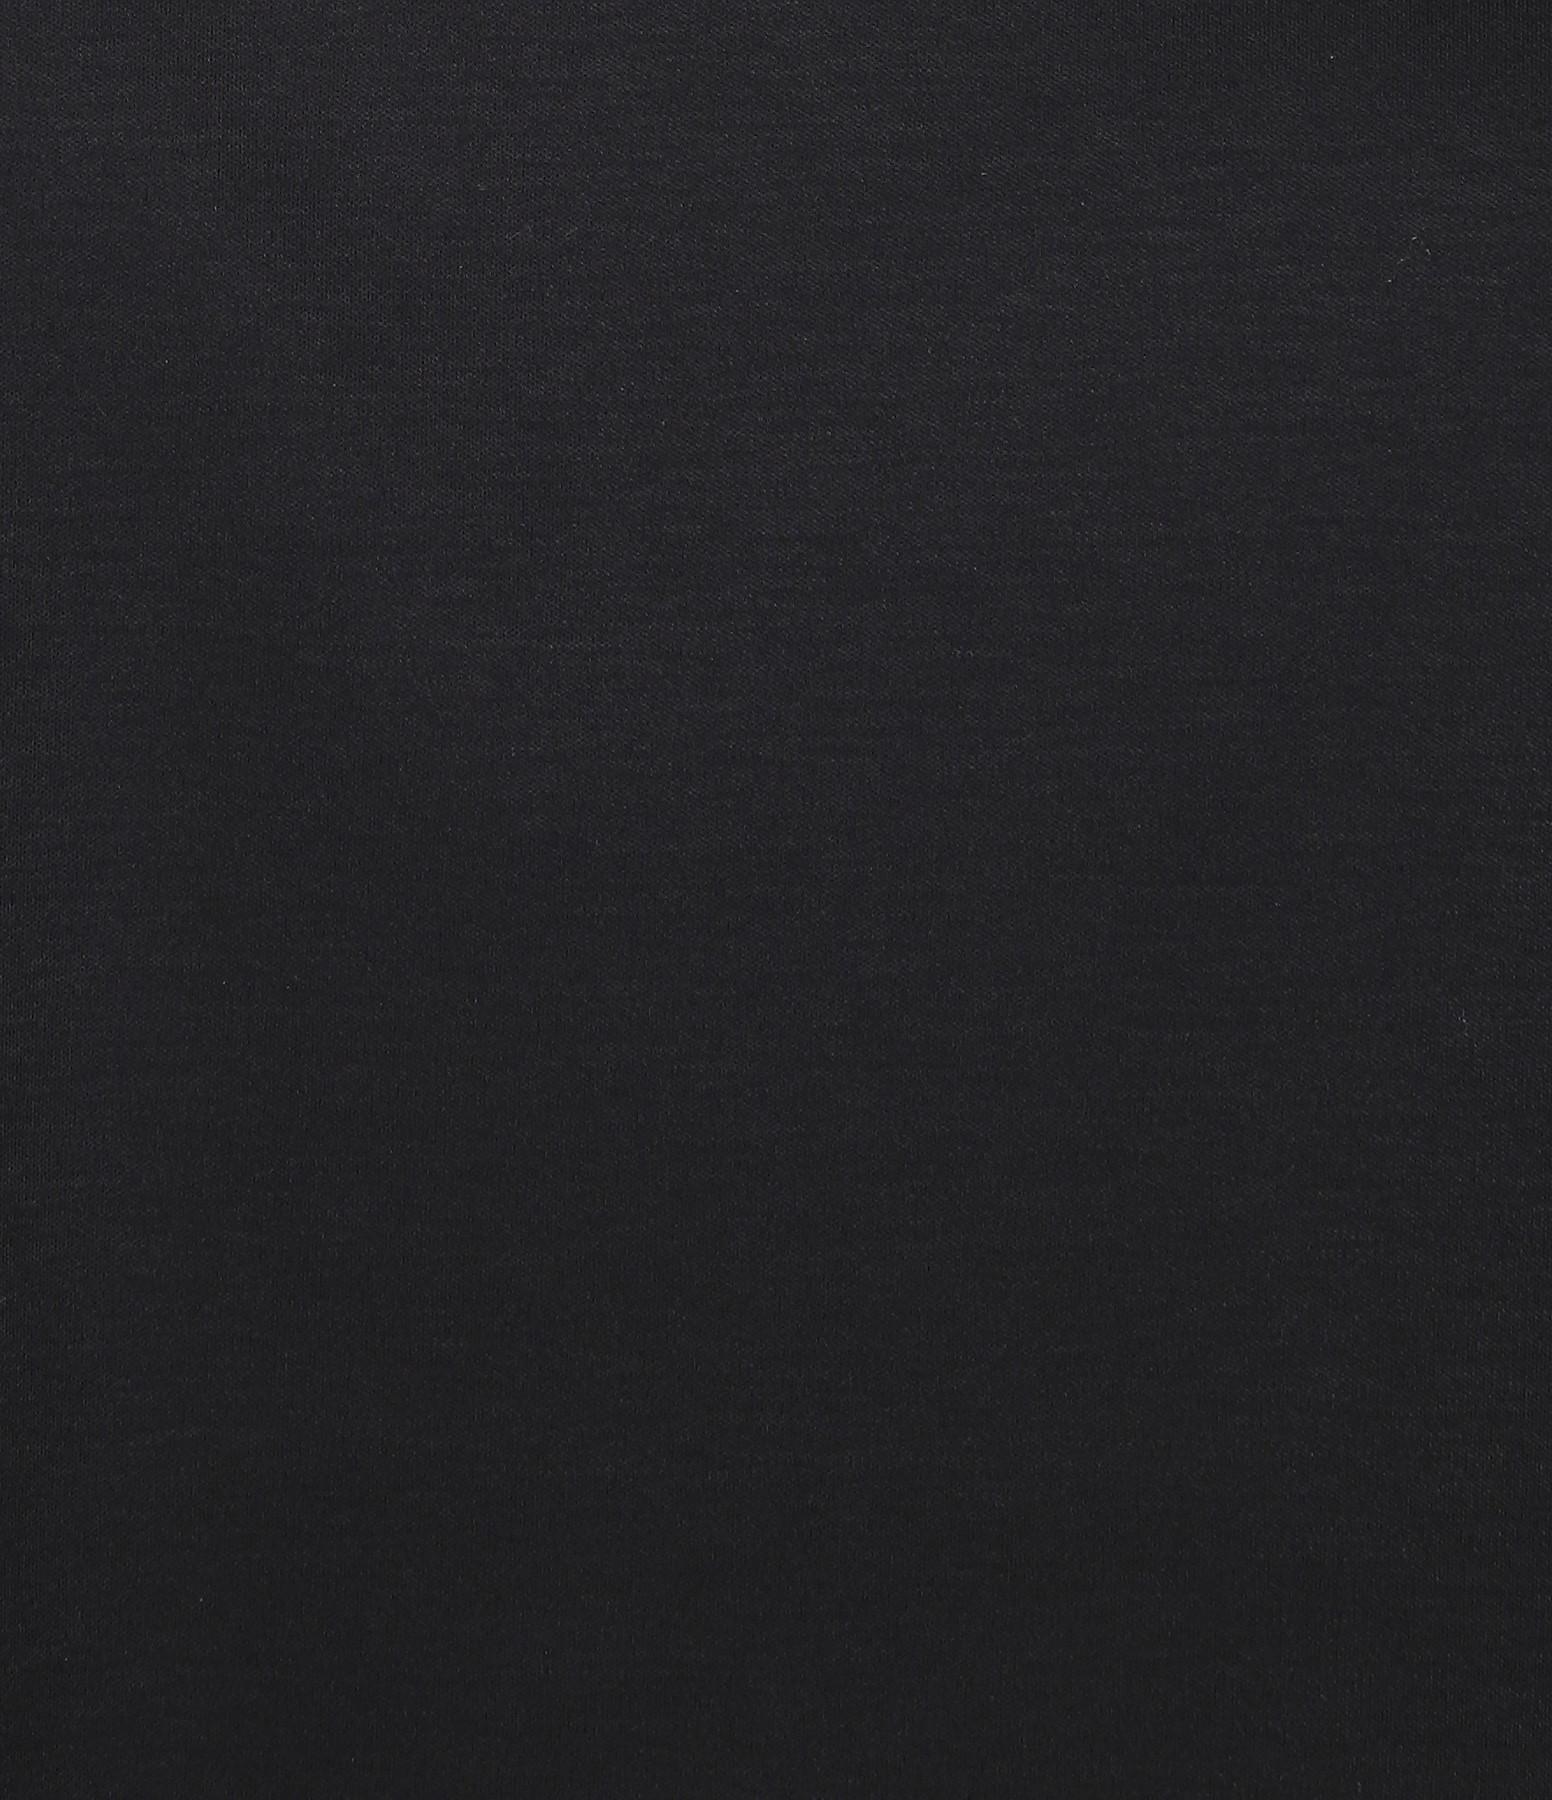 CT PLAGE - Robe Coton Noir